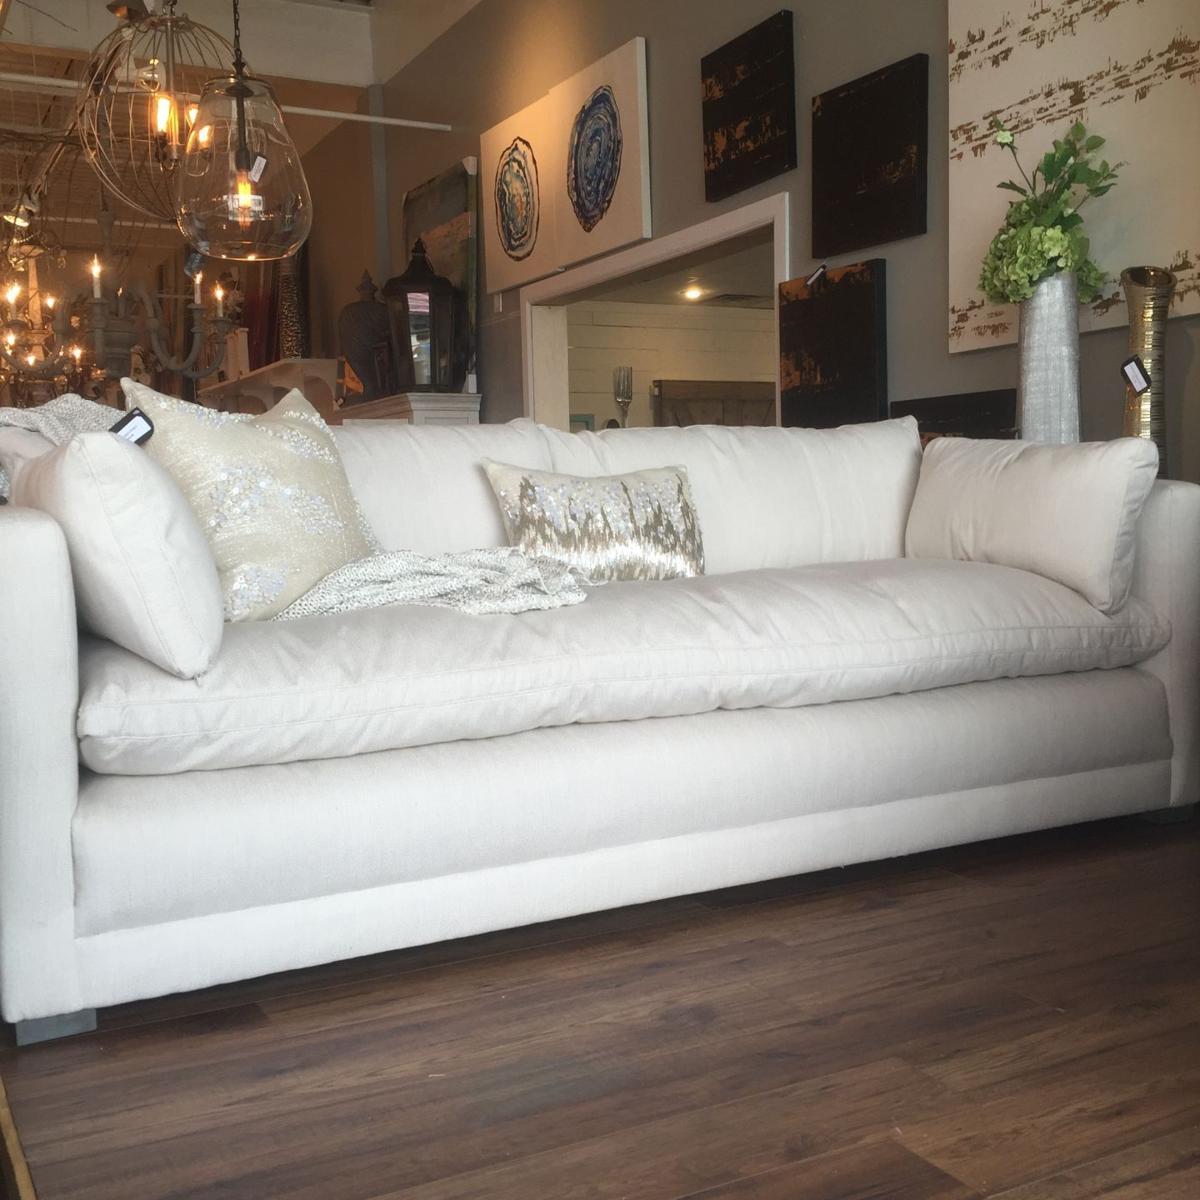 WV Design Team: Use Sunbrella fabrics to make indoor furniture last ...